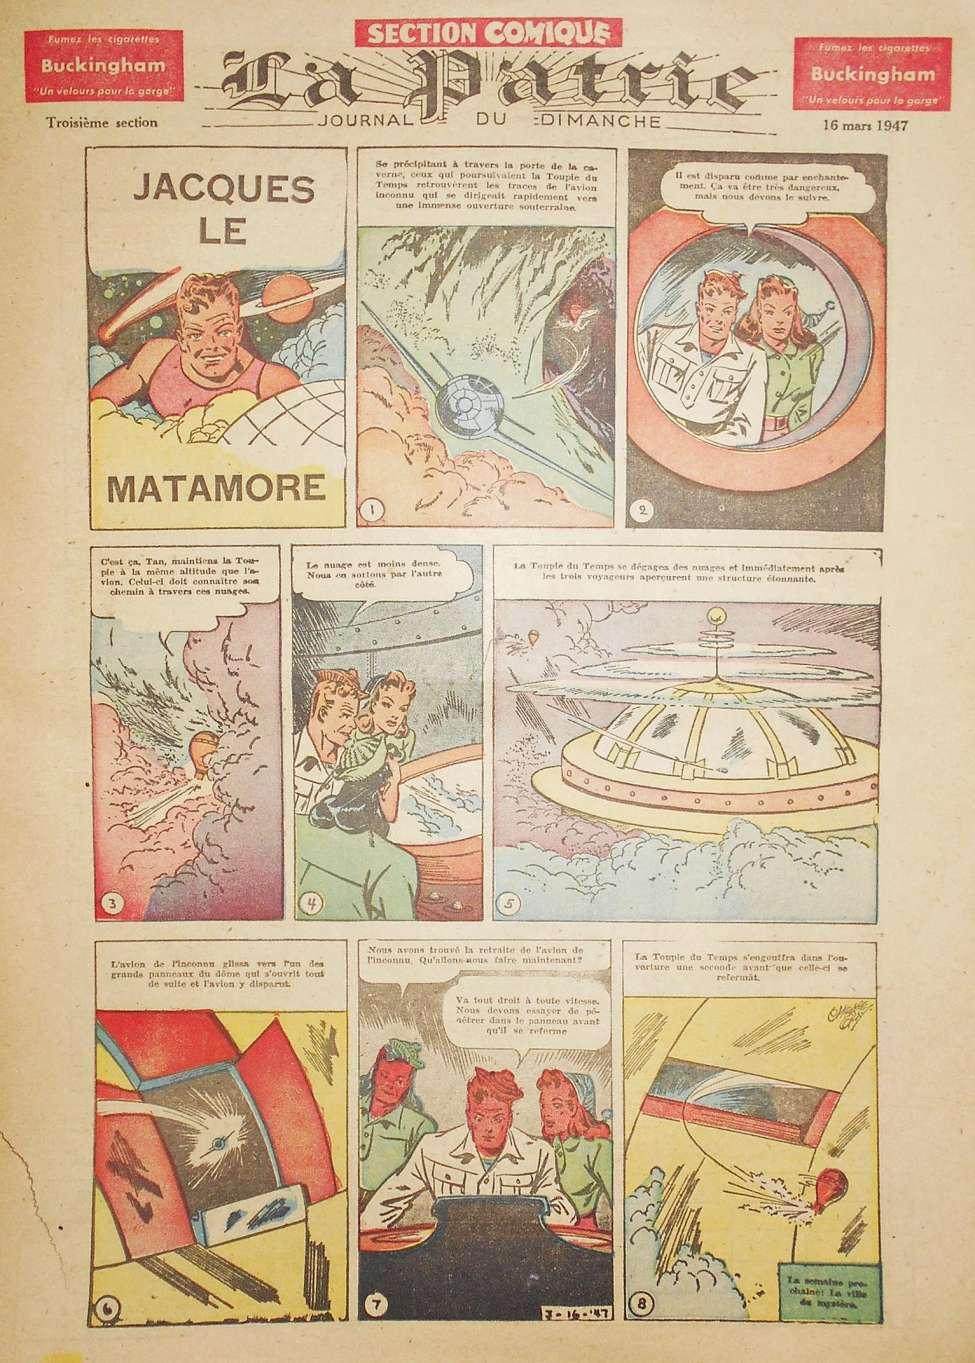 Comic Book Cover For La Patrie - Section Comique (1947-03-16)